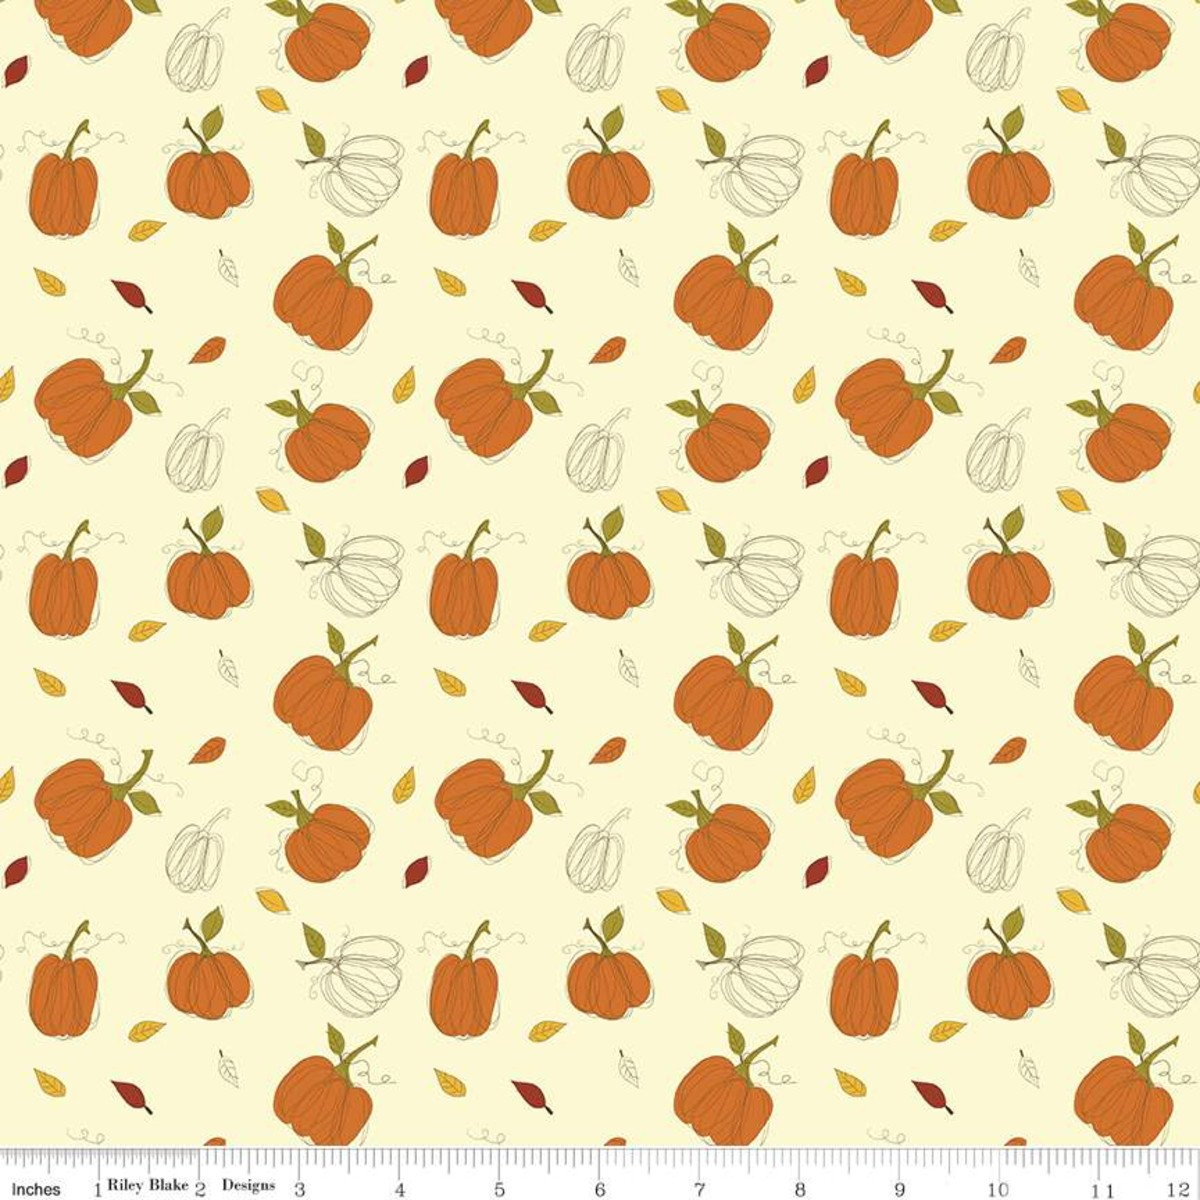 Riley Blake, Adel in Autumn - Pumpkins Cream